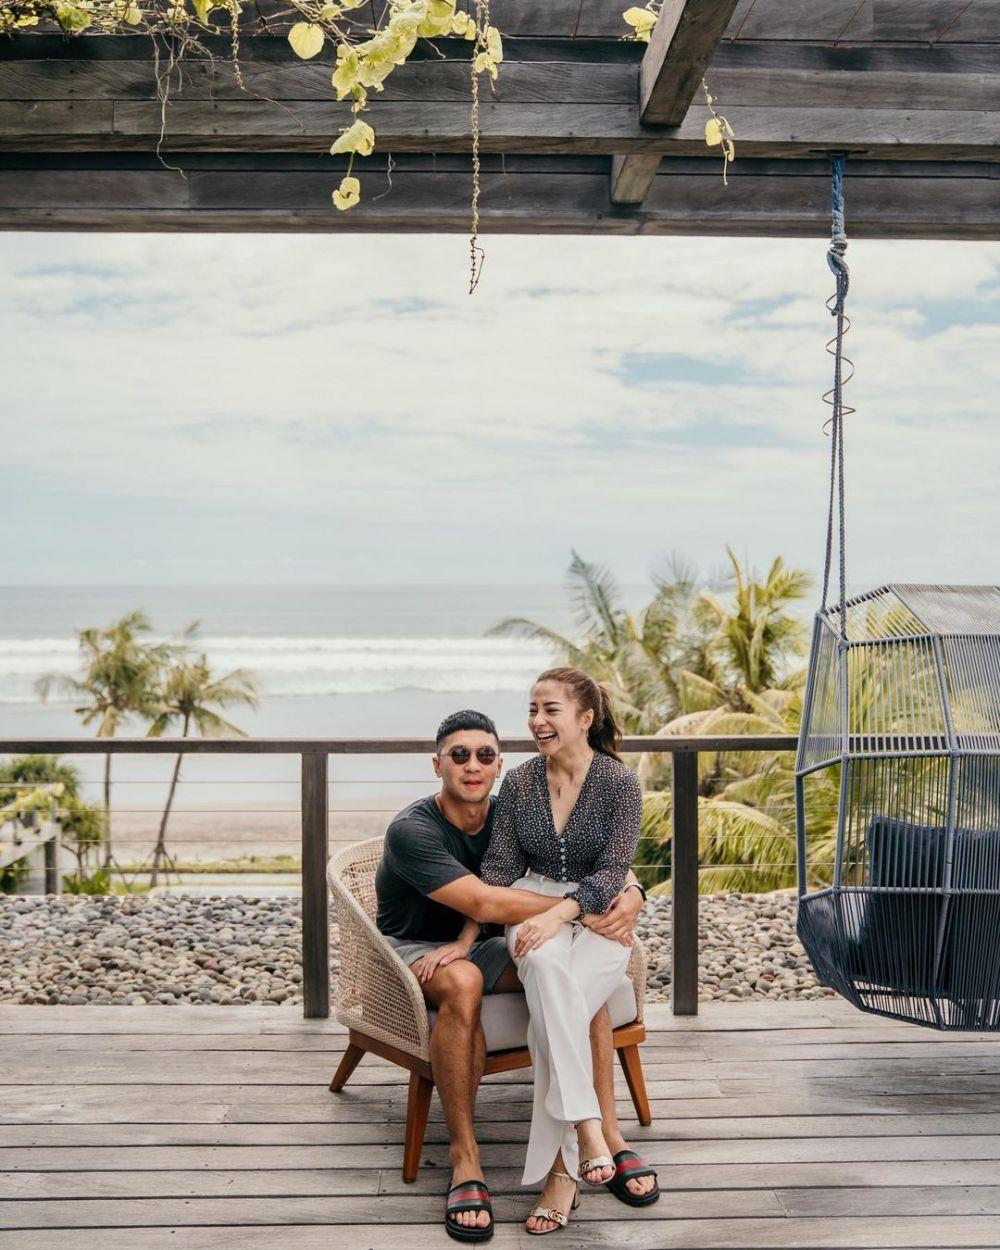 Mesra Banget! 10 Potret Intim Pasangan Artis yang Beda Usia Dua Tahun